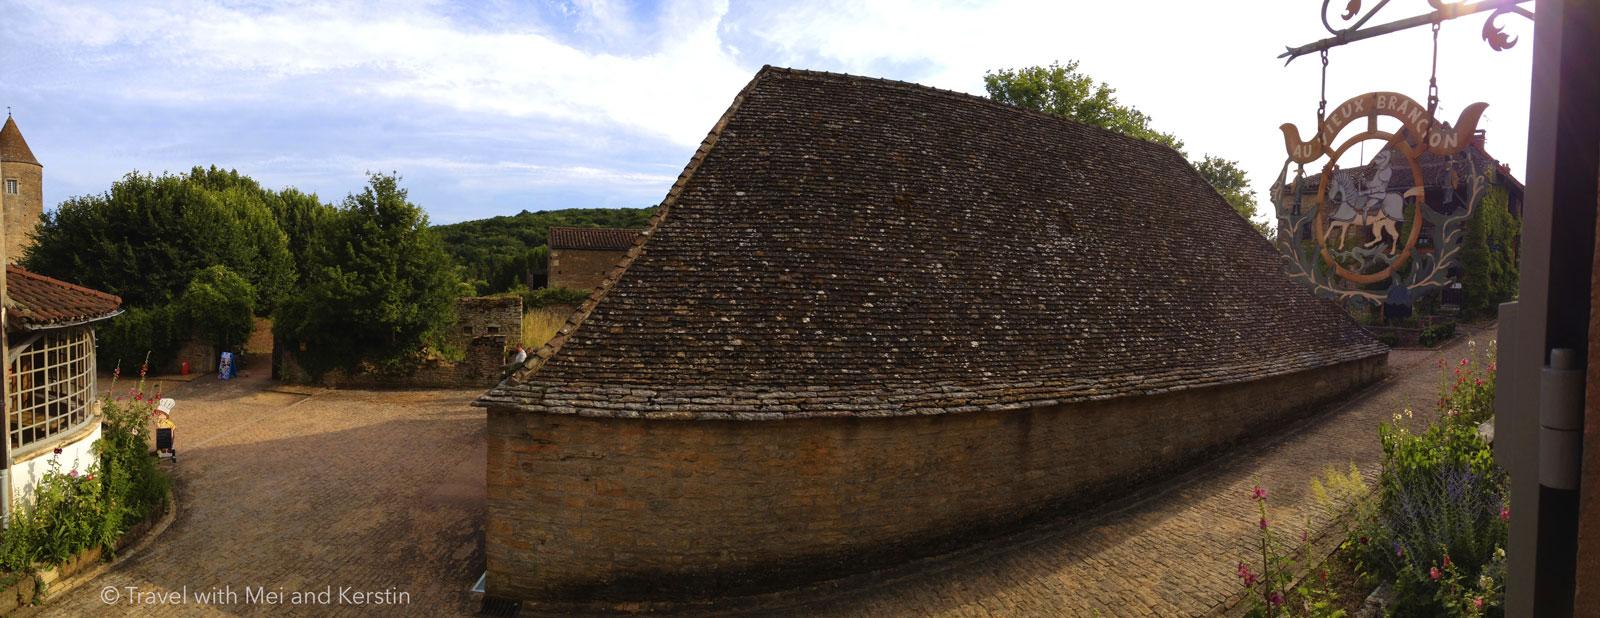 Au Vieux Brancion, Burgundy © Travelwithmk.com